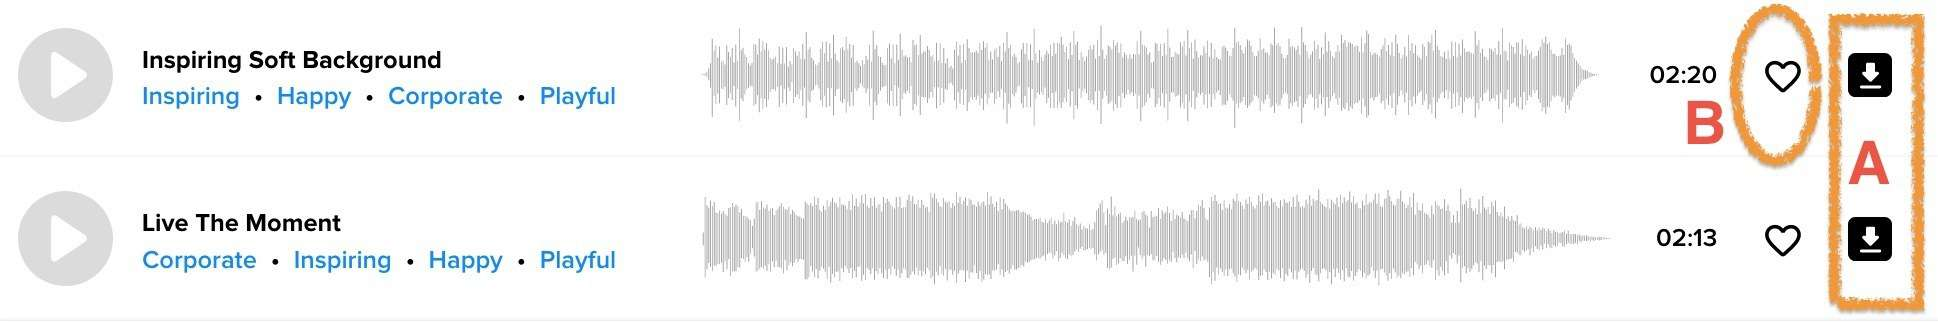 AudioBlocks影片音樂下載界面